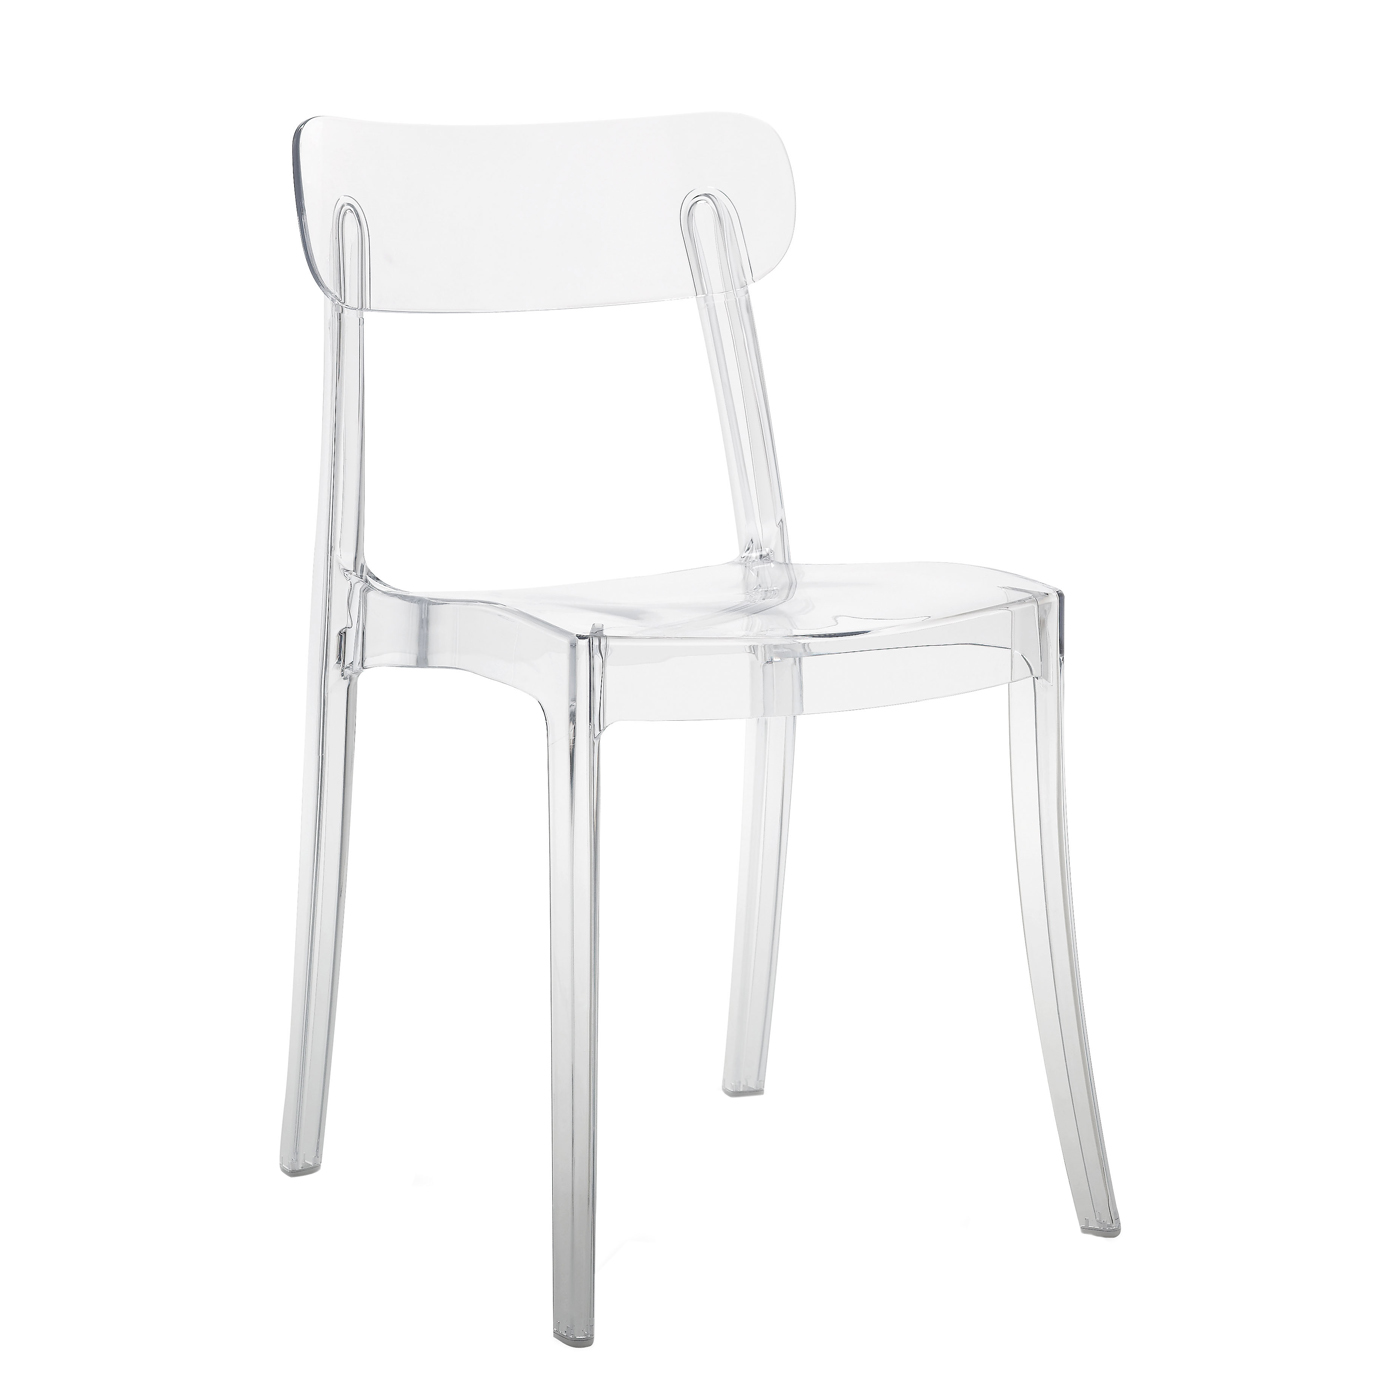 Modern outdoor transparent cafe chair